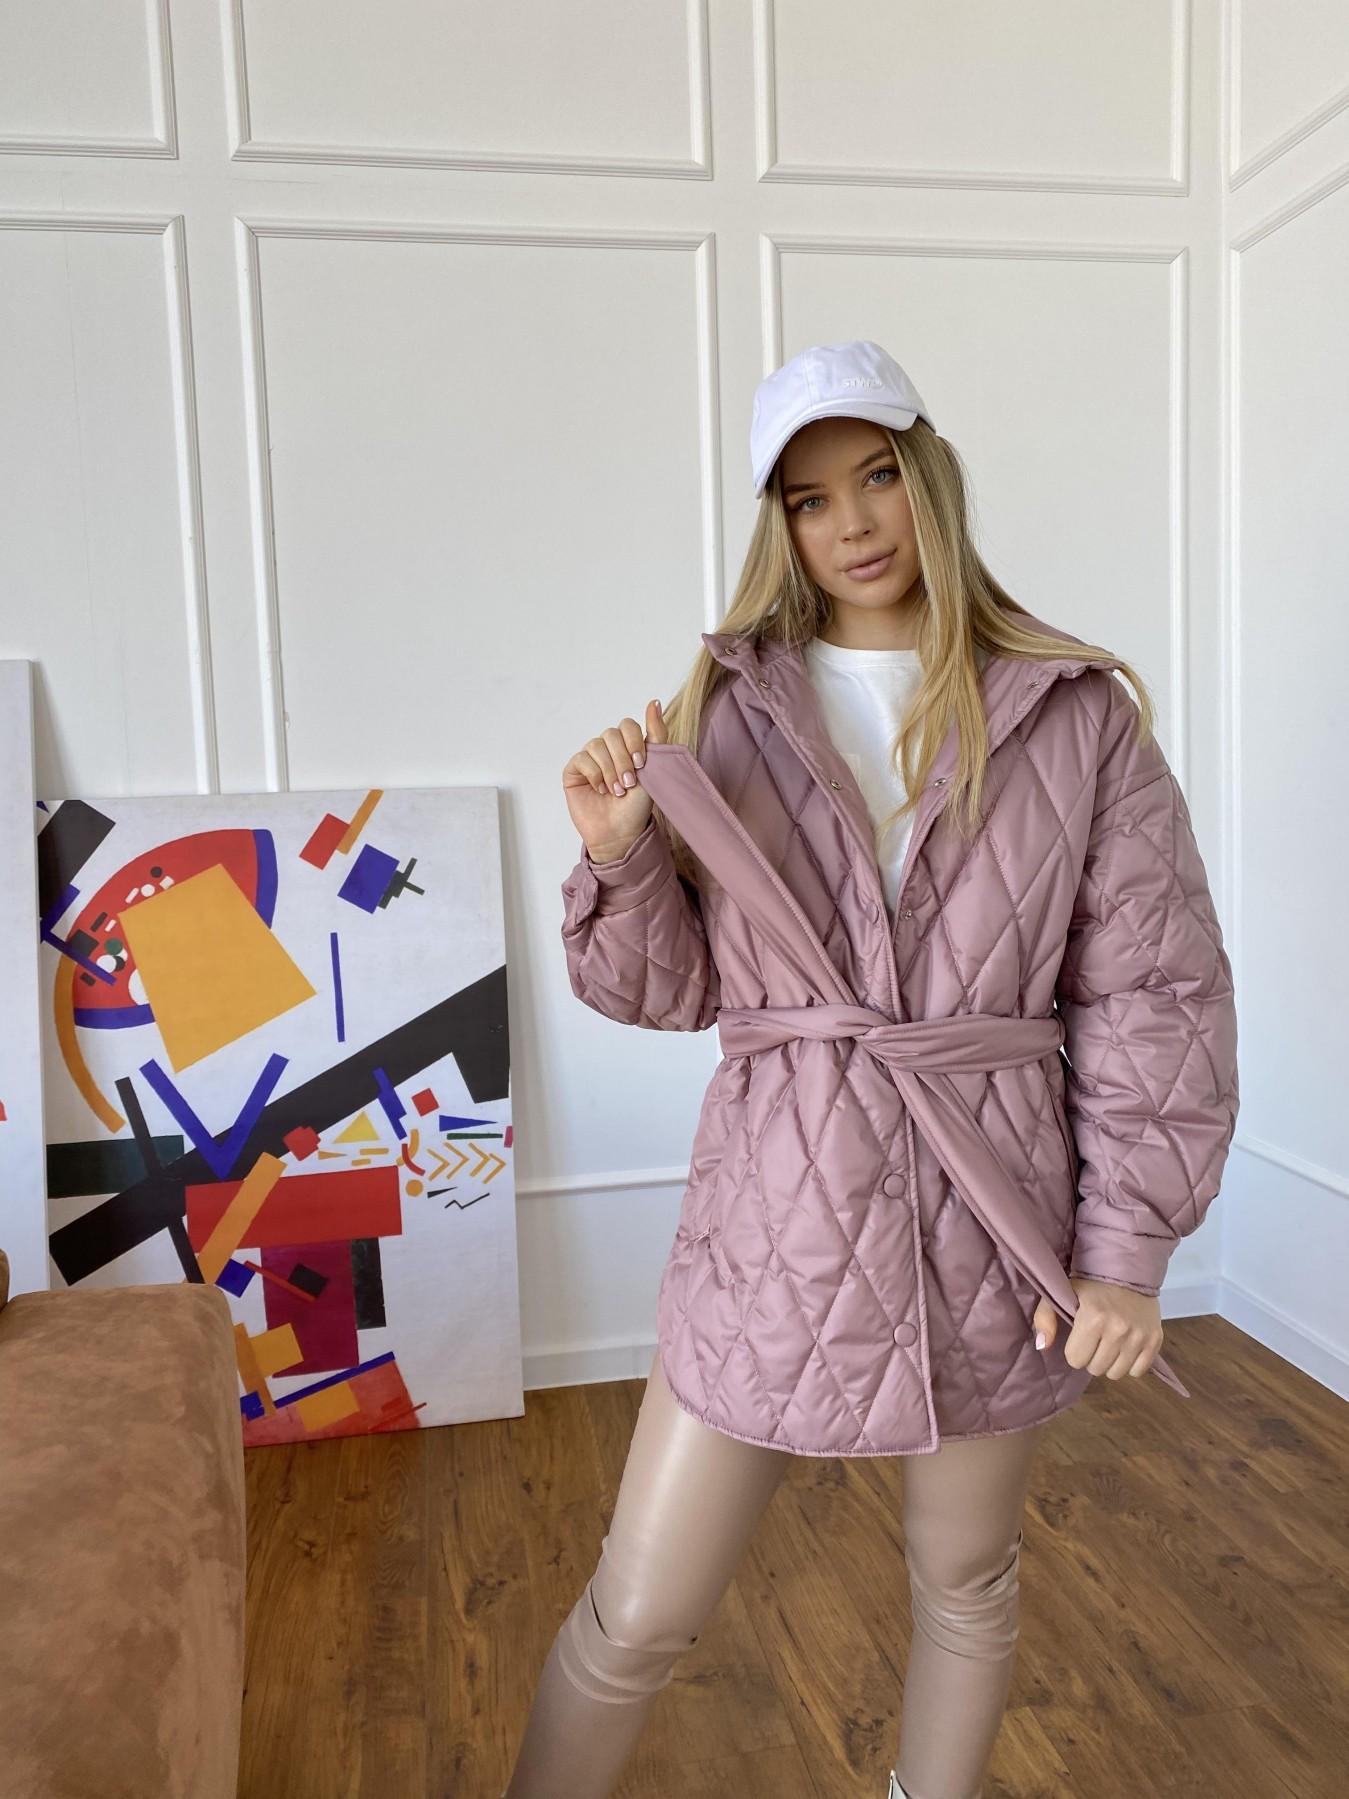 Пазл стеганая куртка из плащевки 10890 АРТ. 47400 Цвет: Пудра - фото 2, интернет магазин tm-modus.ru